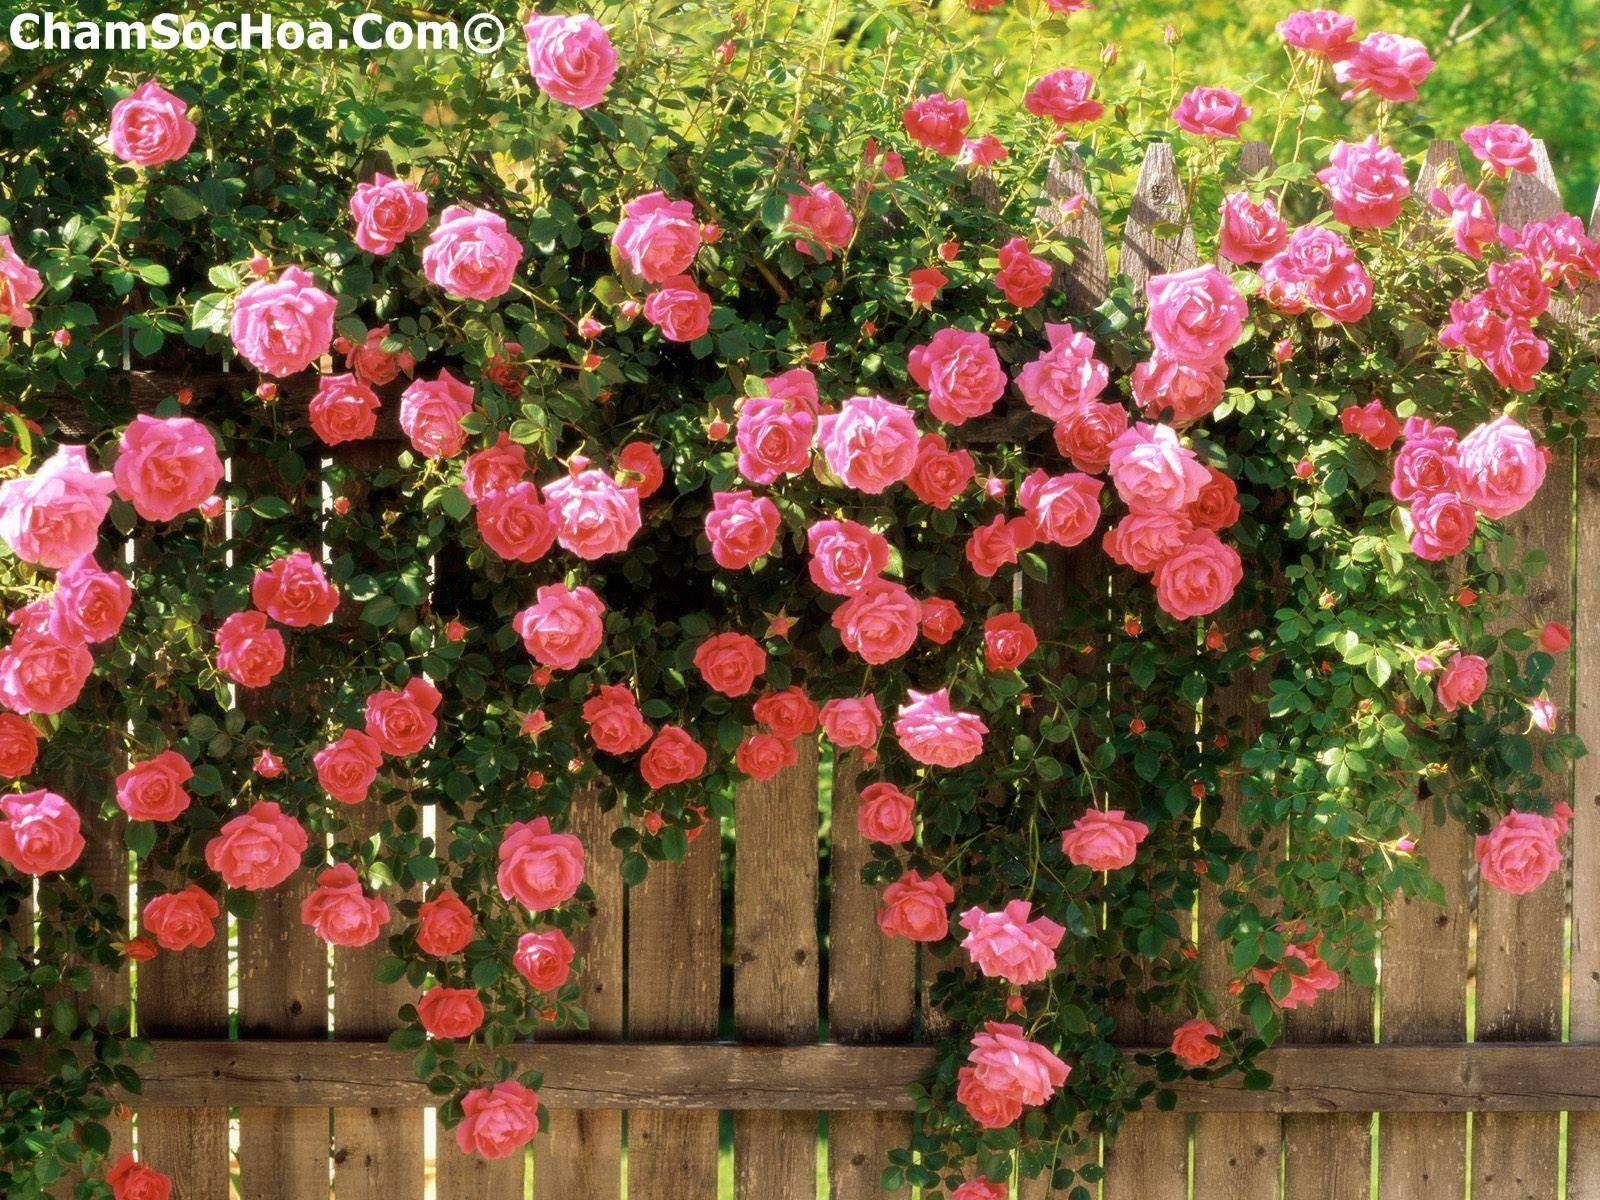 Cách trồng hoa hồng trong chậu #rose #flower #flowers | Cách trồng ...